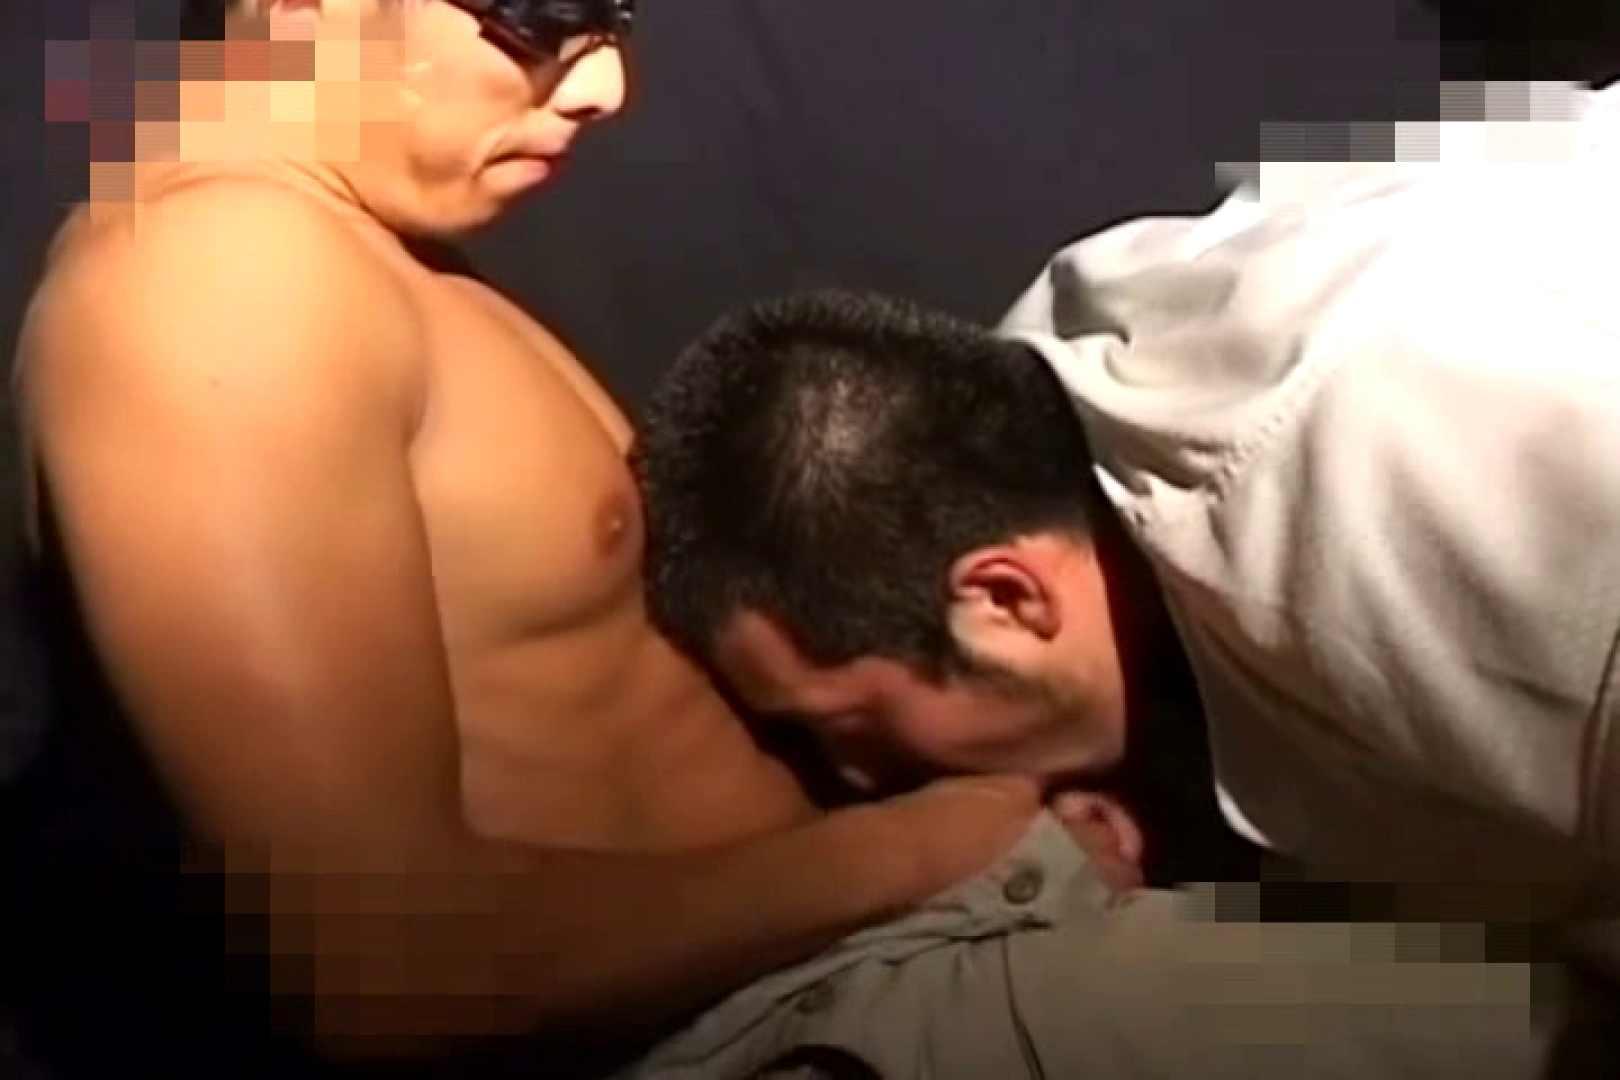 Beautiful muscle モッコリ野郎達!Vol.05 念願の完全無修正 ゲイ射精画像 50連発 44